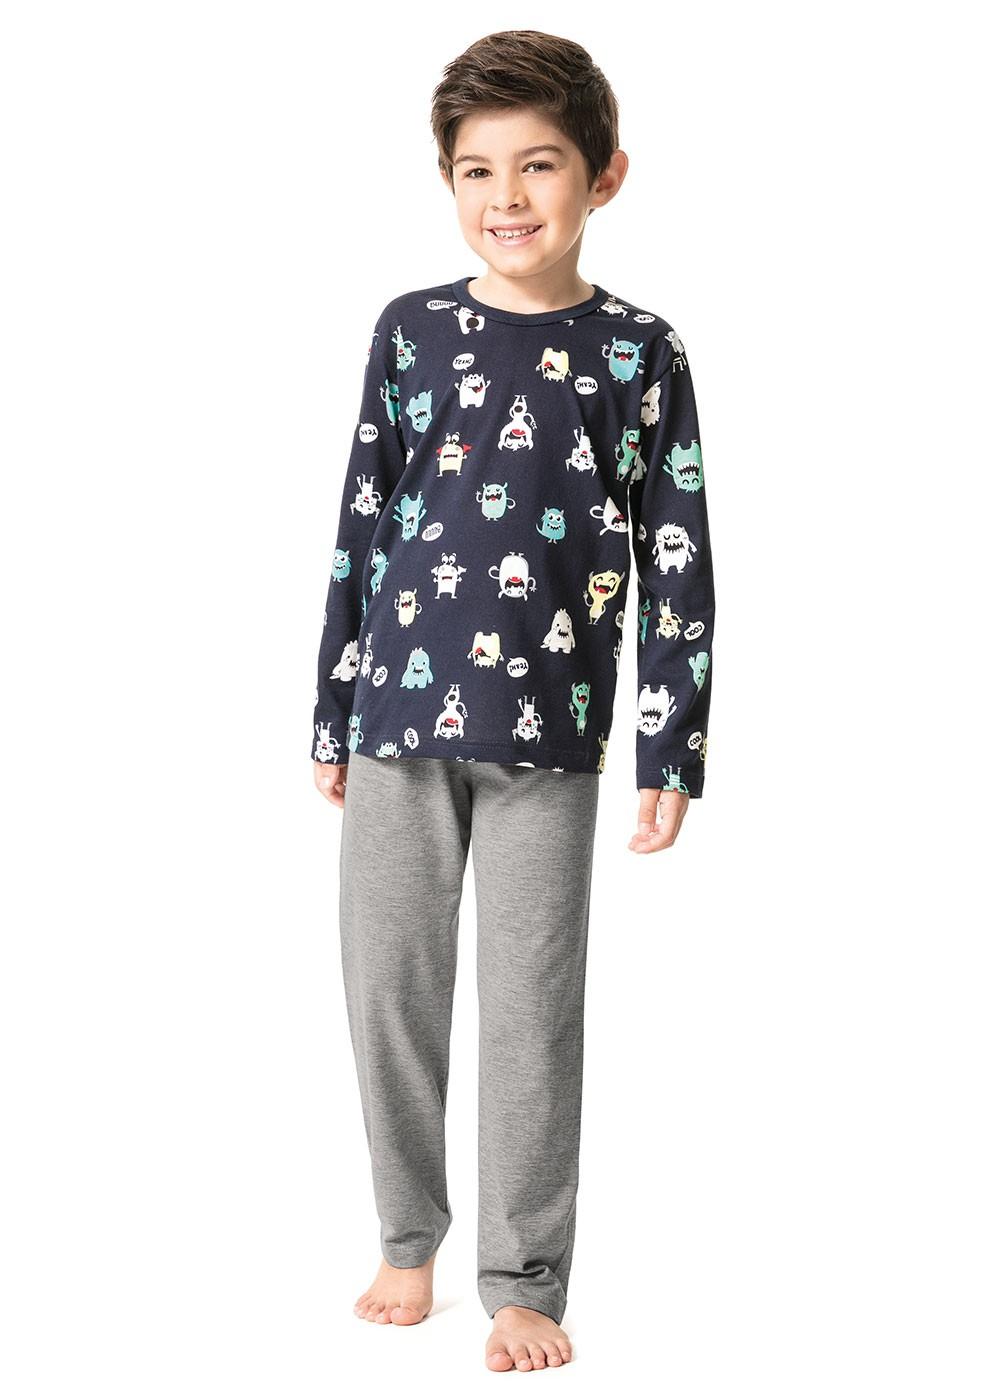 Pijama Infantil Masculino Inverno Azul Monsters Malwee